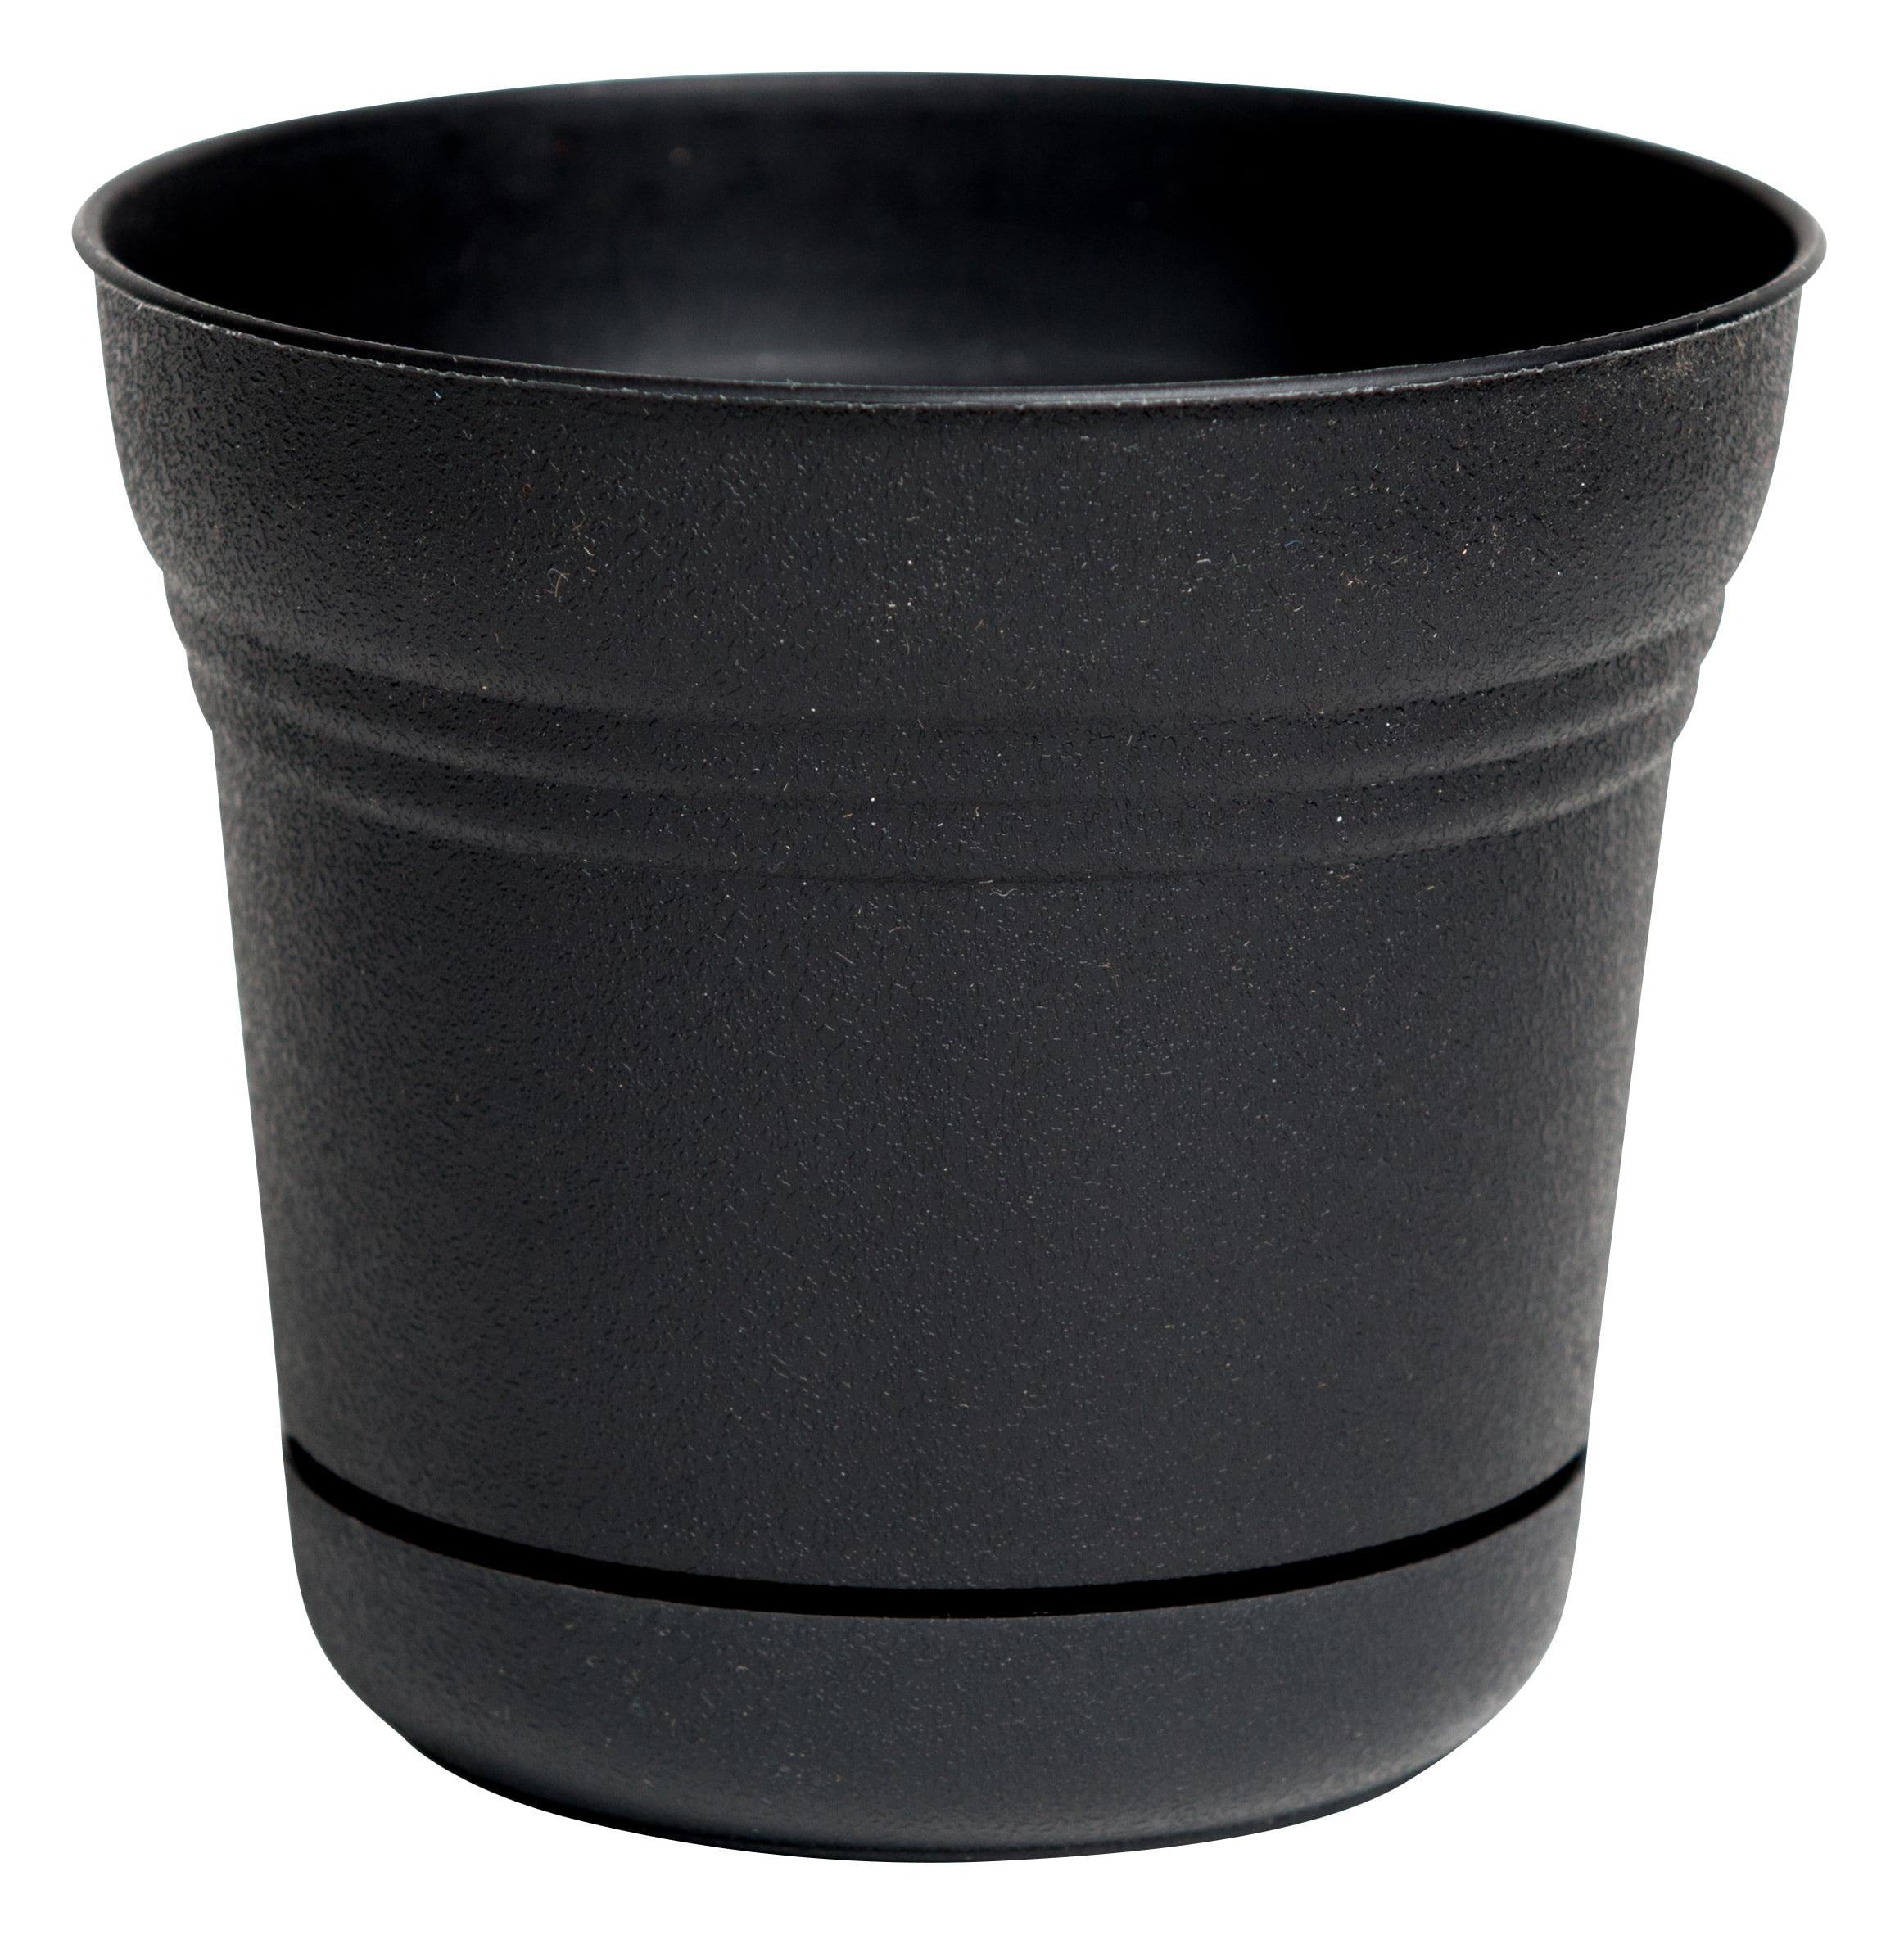 "Bloem Saturn Planter with Saucer 12"" Black"